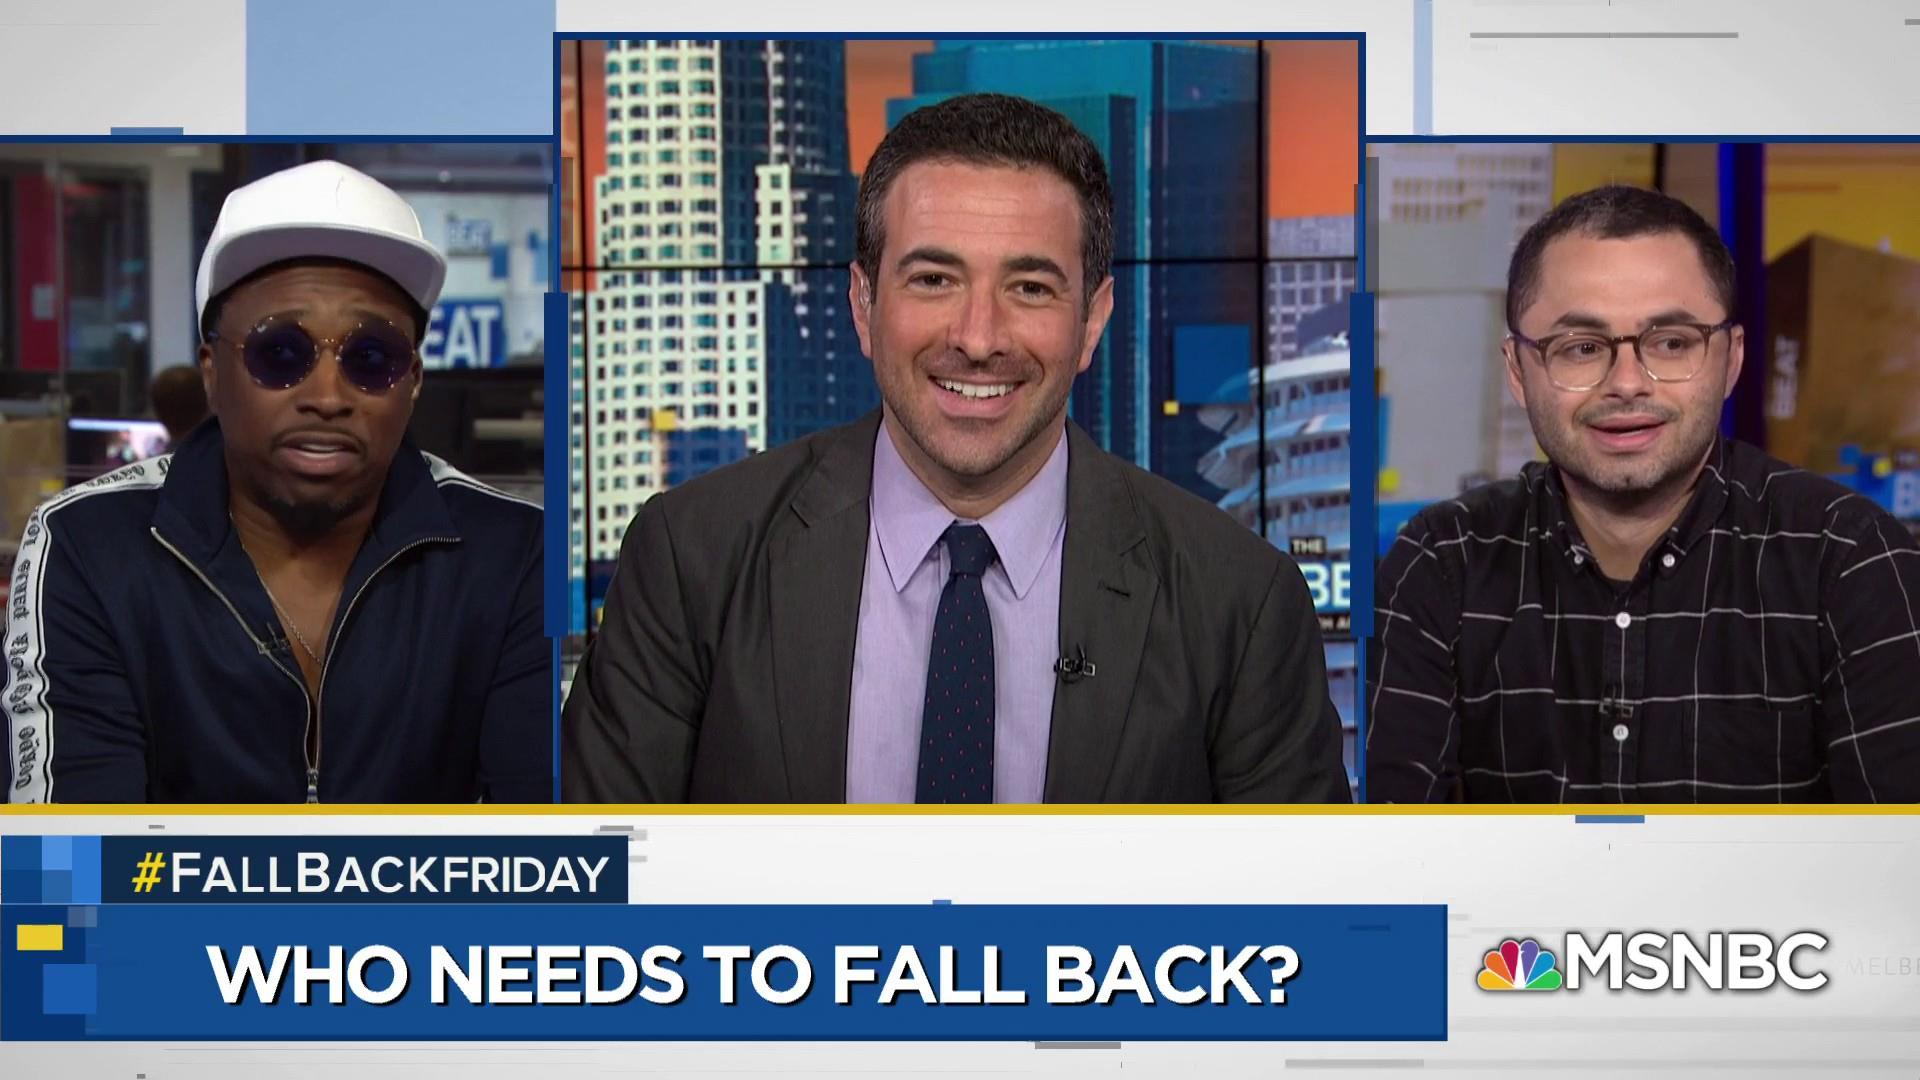 Fallback Friday: Eddie griffin, Joe Mande reveal 'Q' in the QAnon Conspiracy